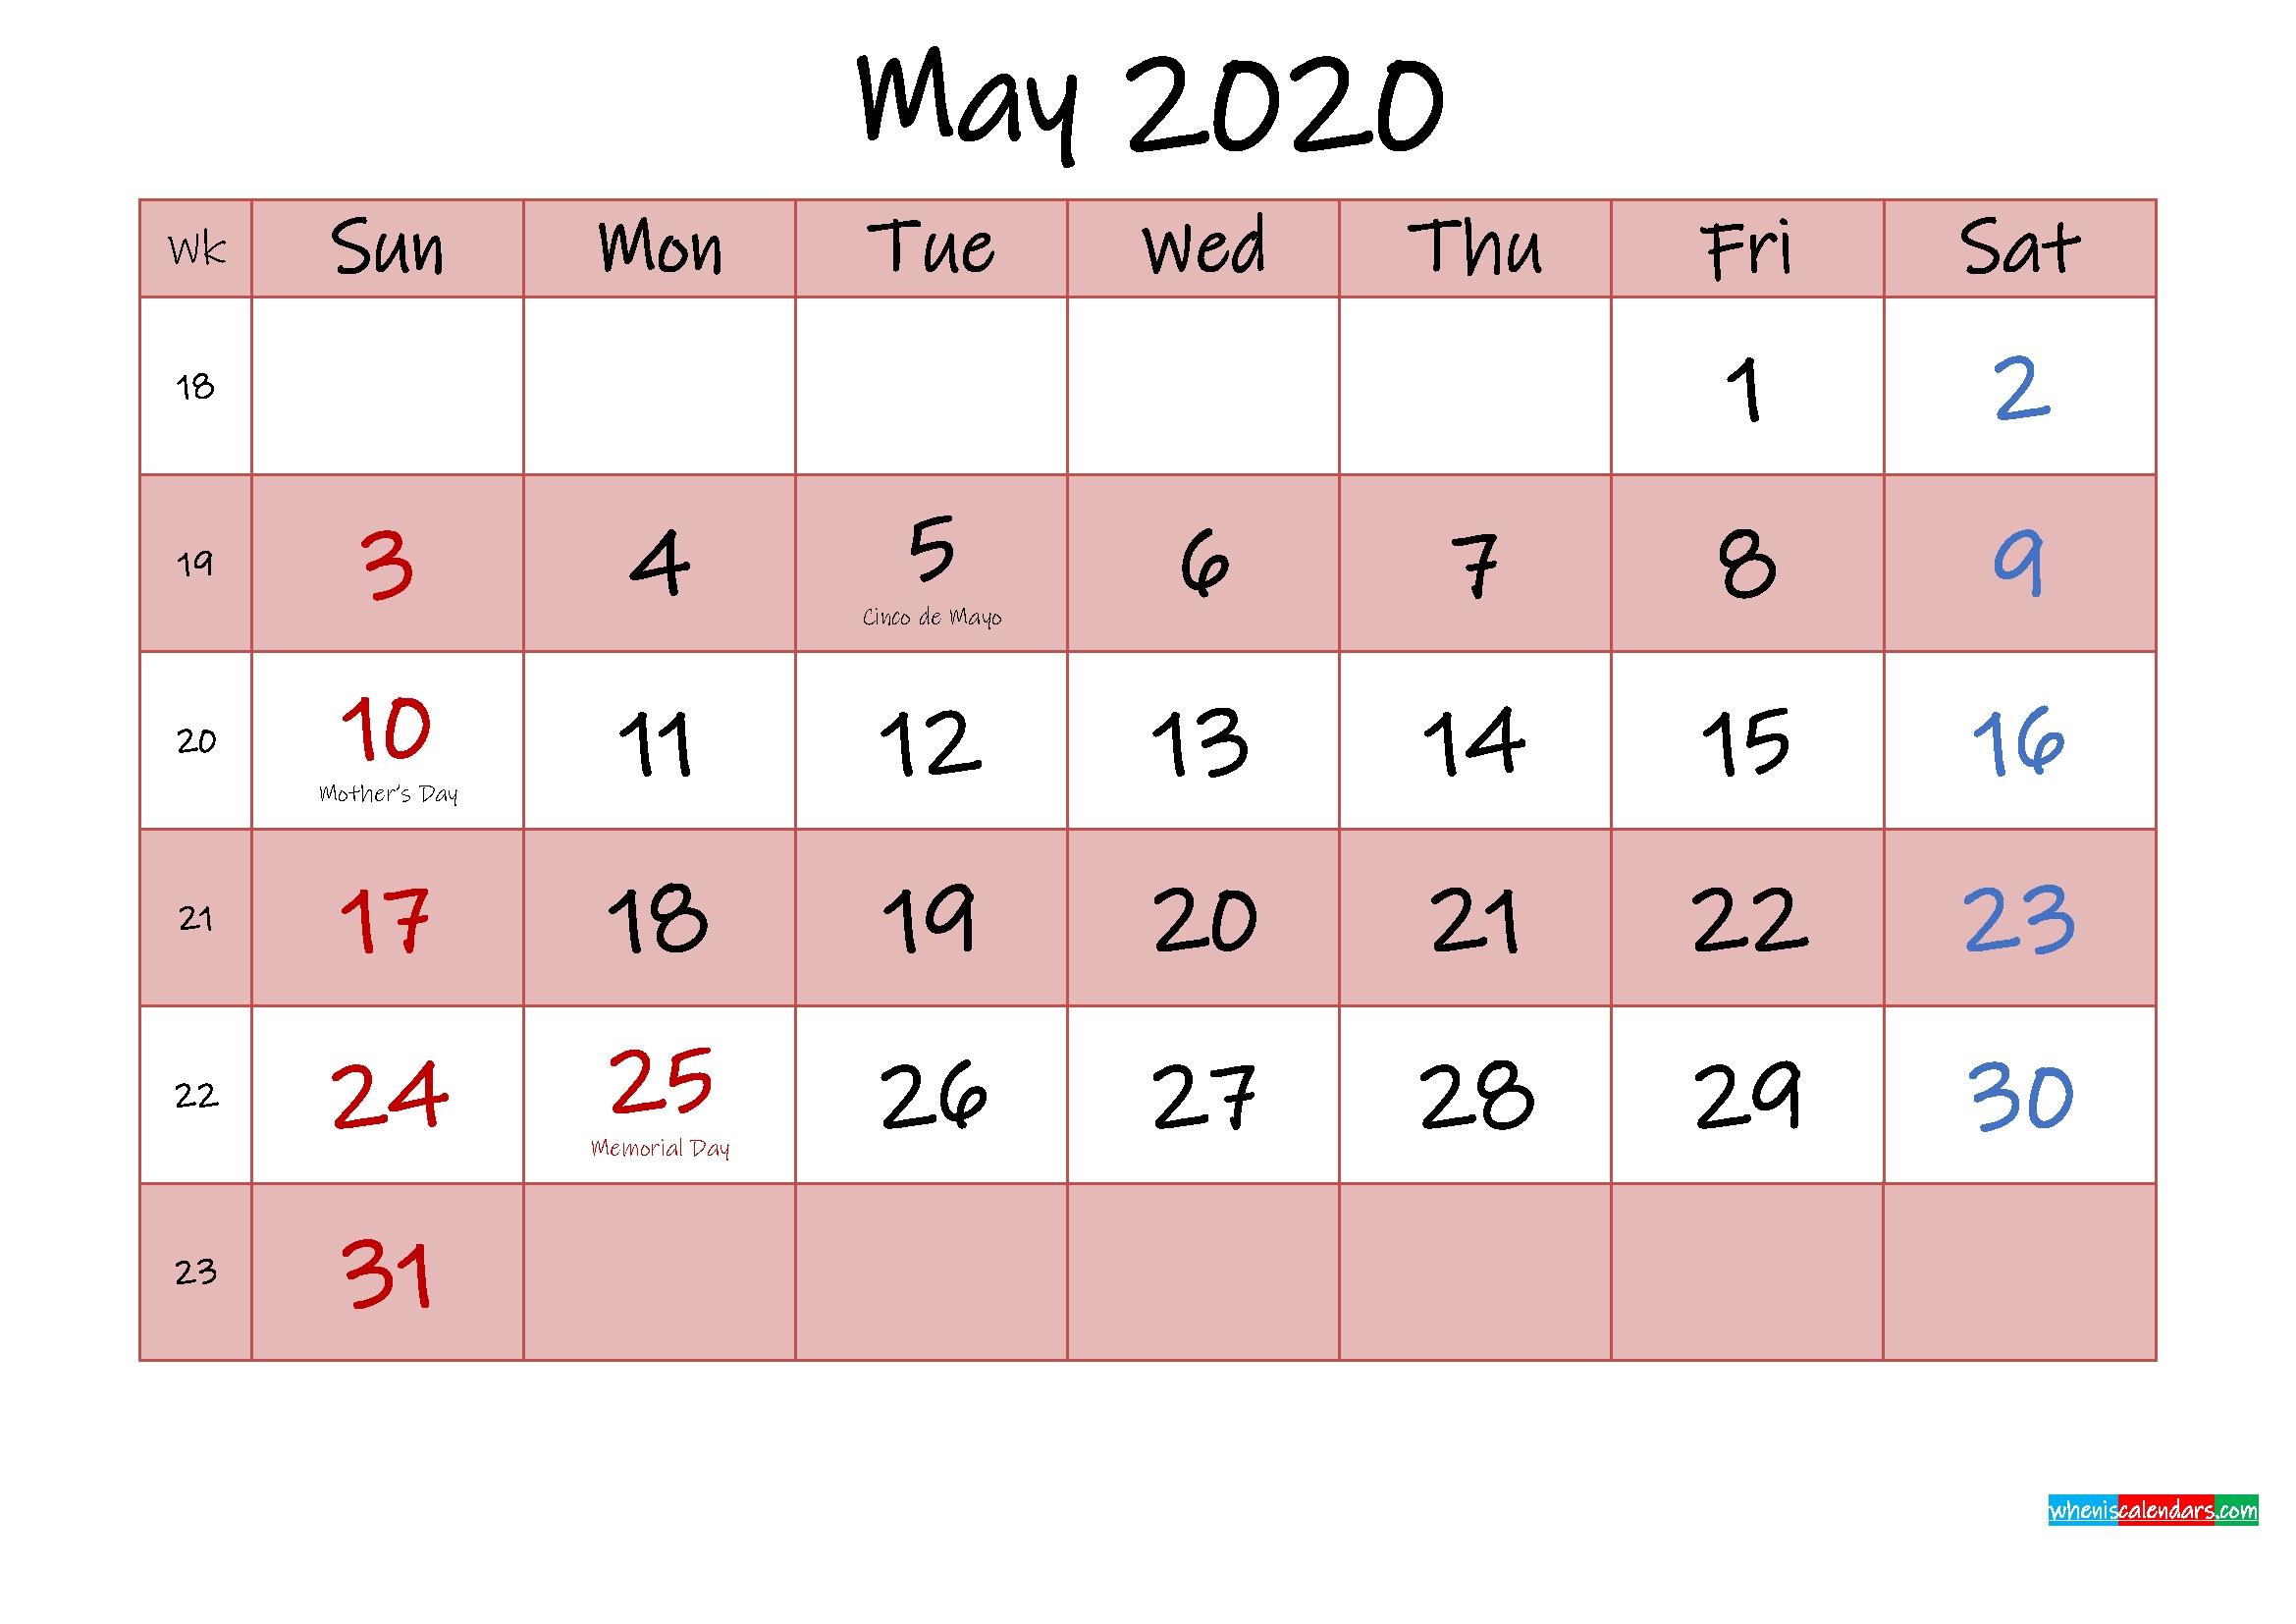 Free Printable Coloring Calendar 2020 May - Template No.ink20M437 - Free Printable 2020 Monthly June 2021 Calendar Holidays